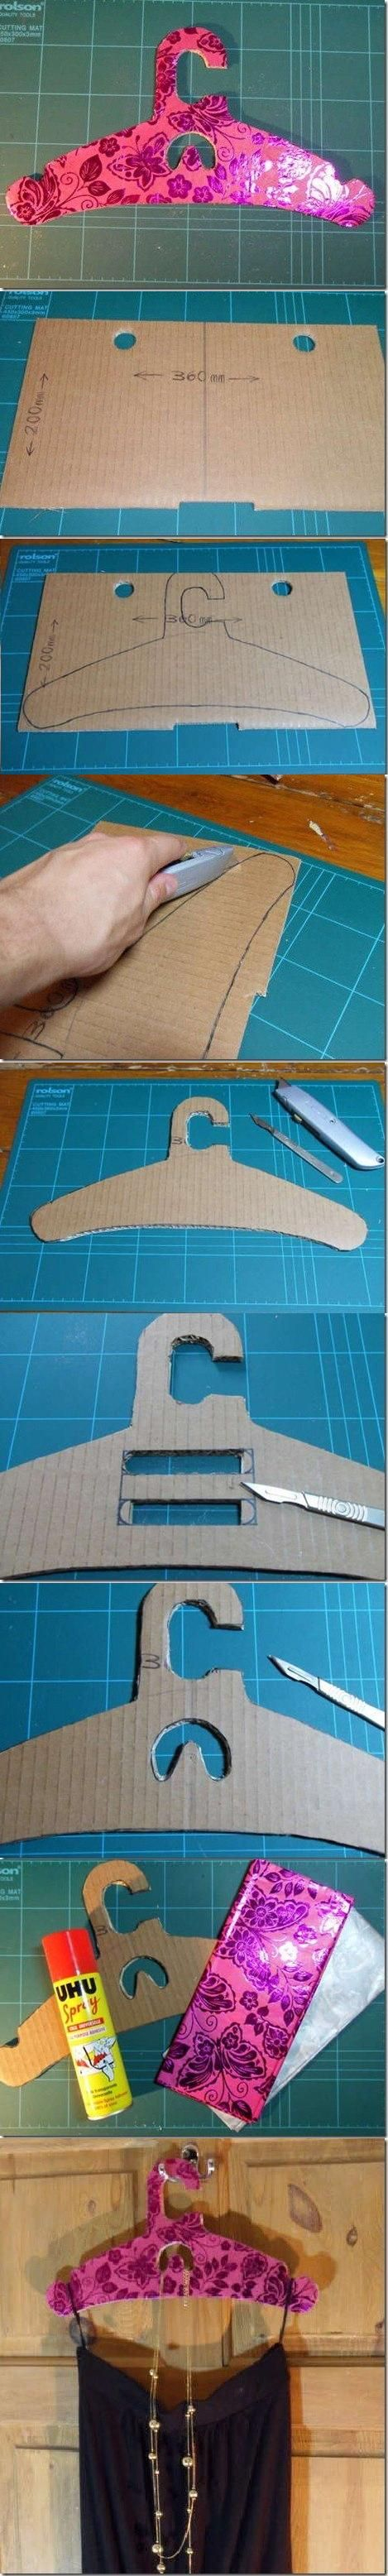 Percha de cartón, paso a paso   -   DIY Cardboard Dress Hanger                                                                                                                                                      Más